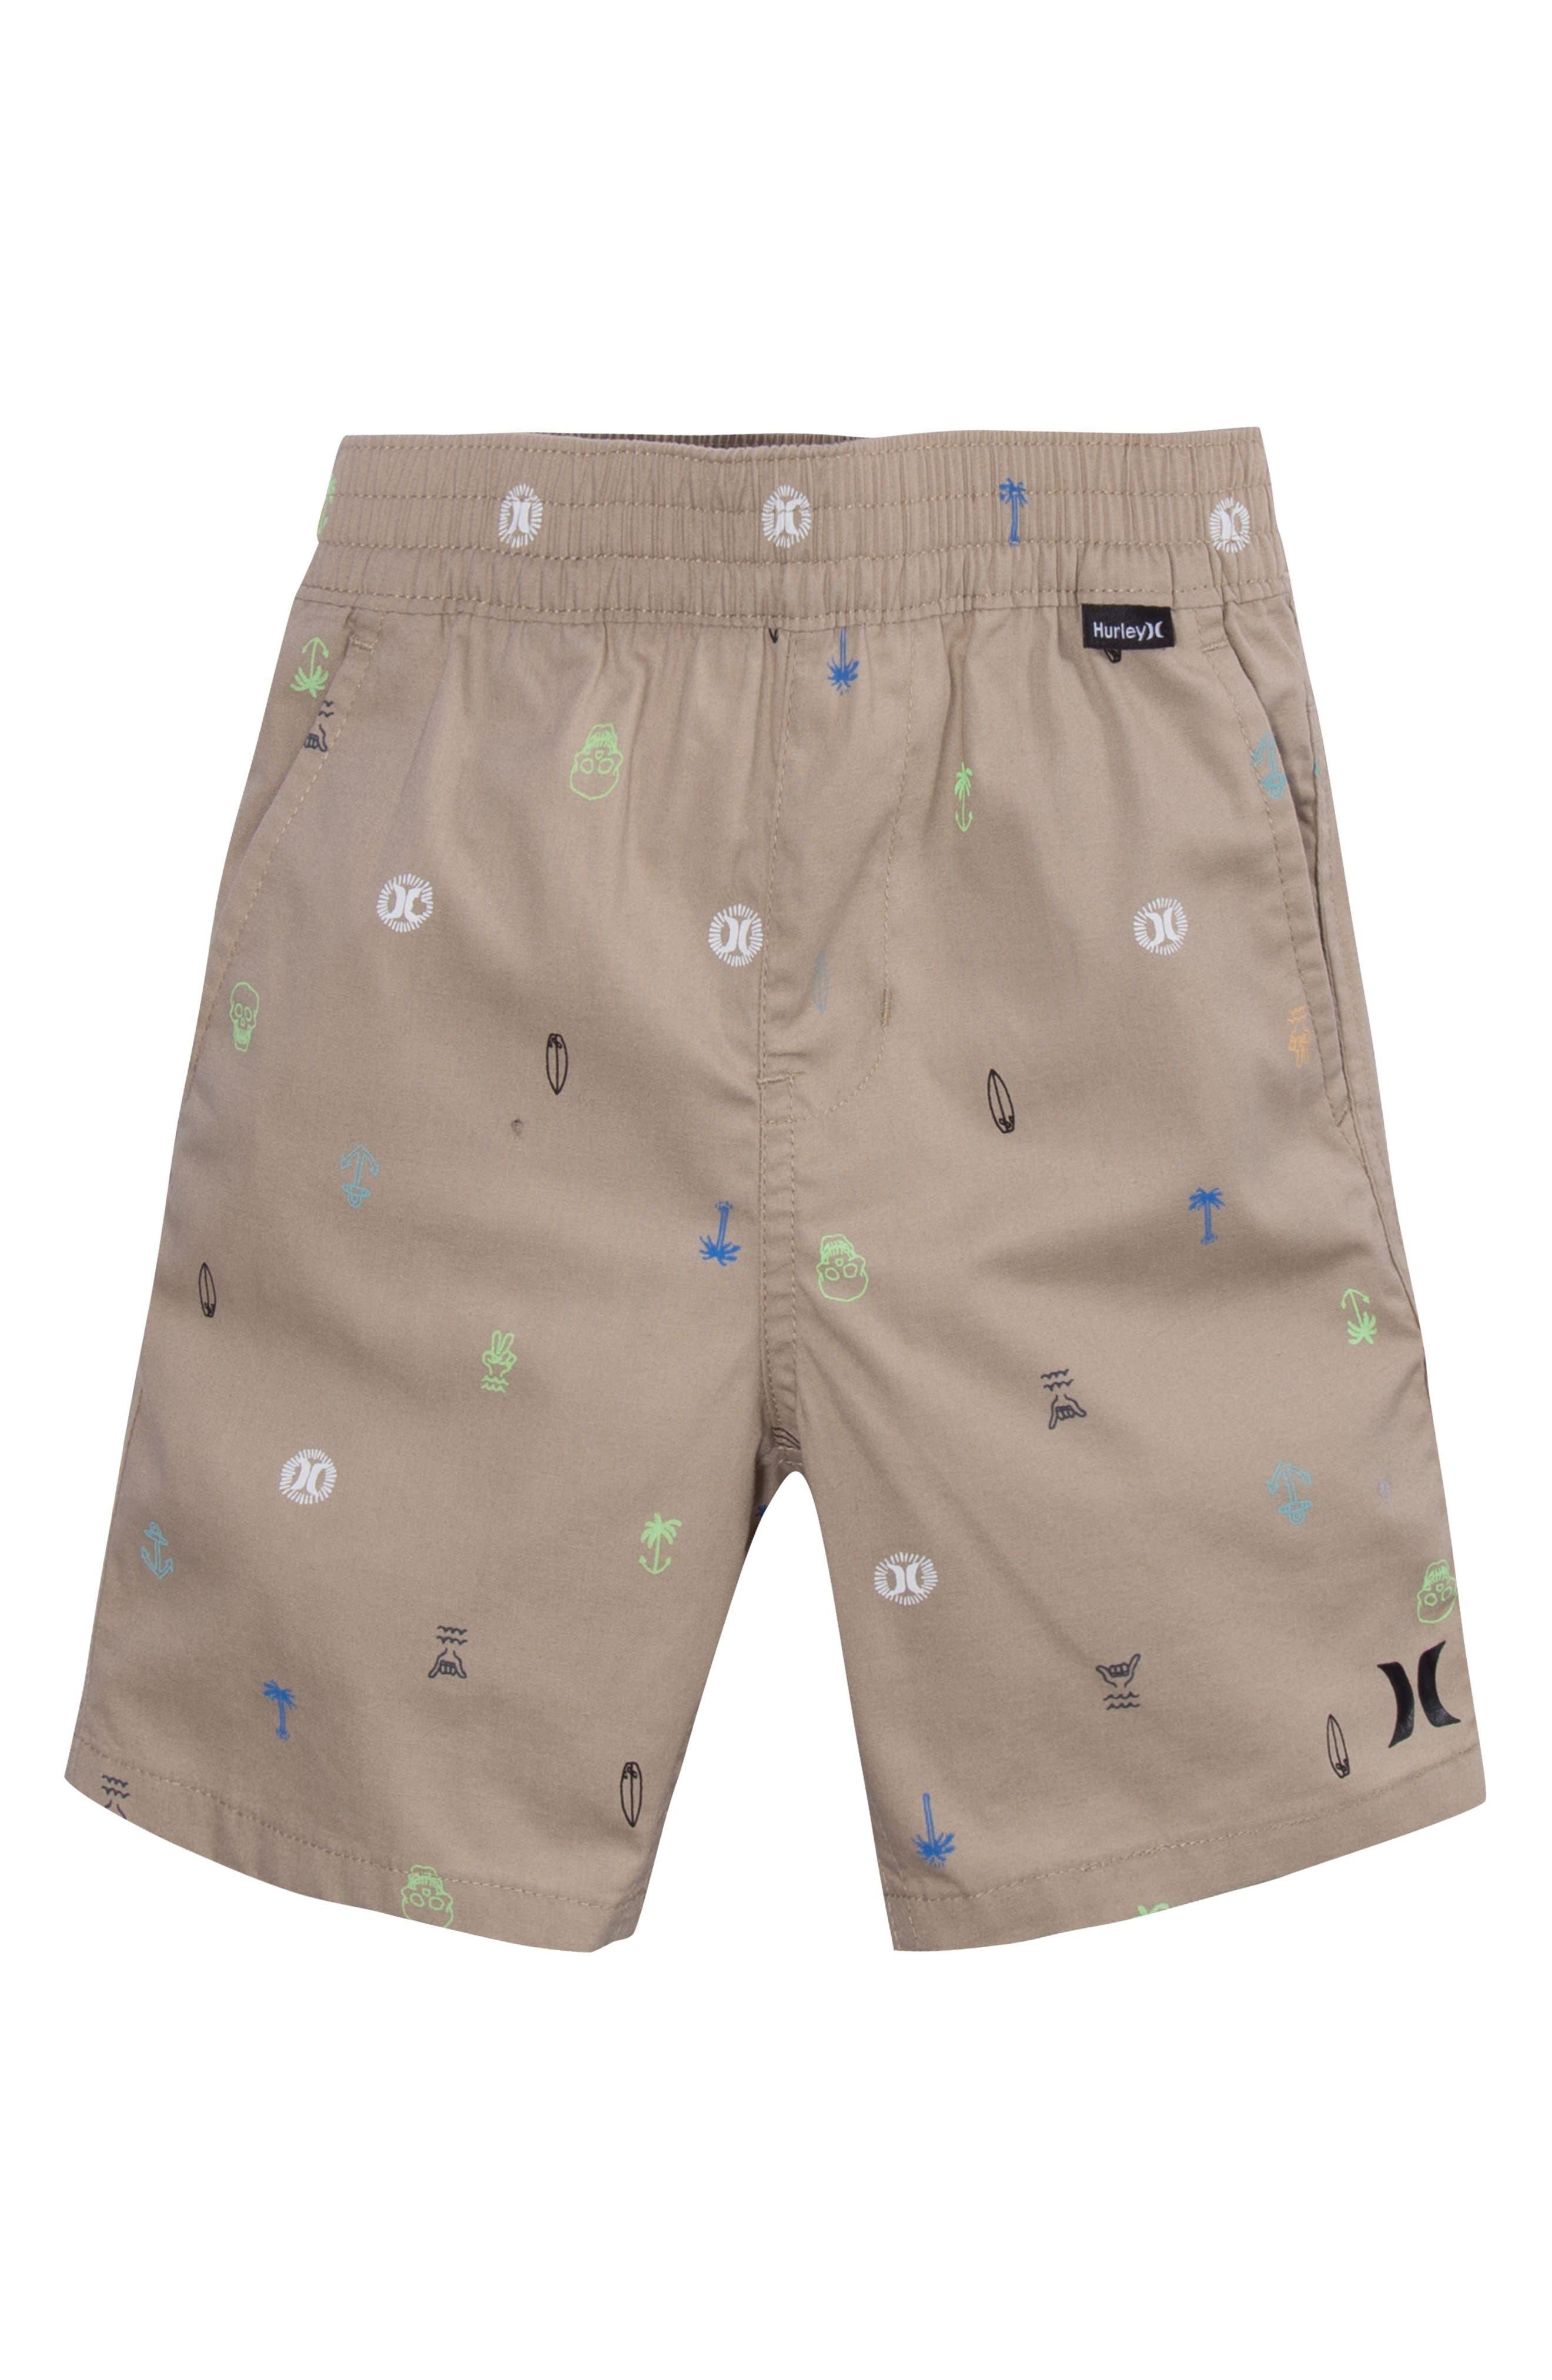 Alternate Image 1 Selected - Hurley Print Pull-On Shorts (Big Boys)